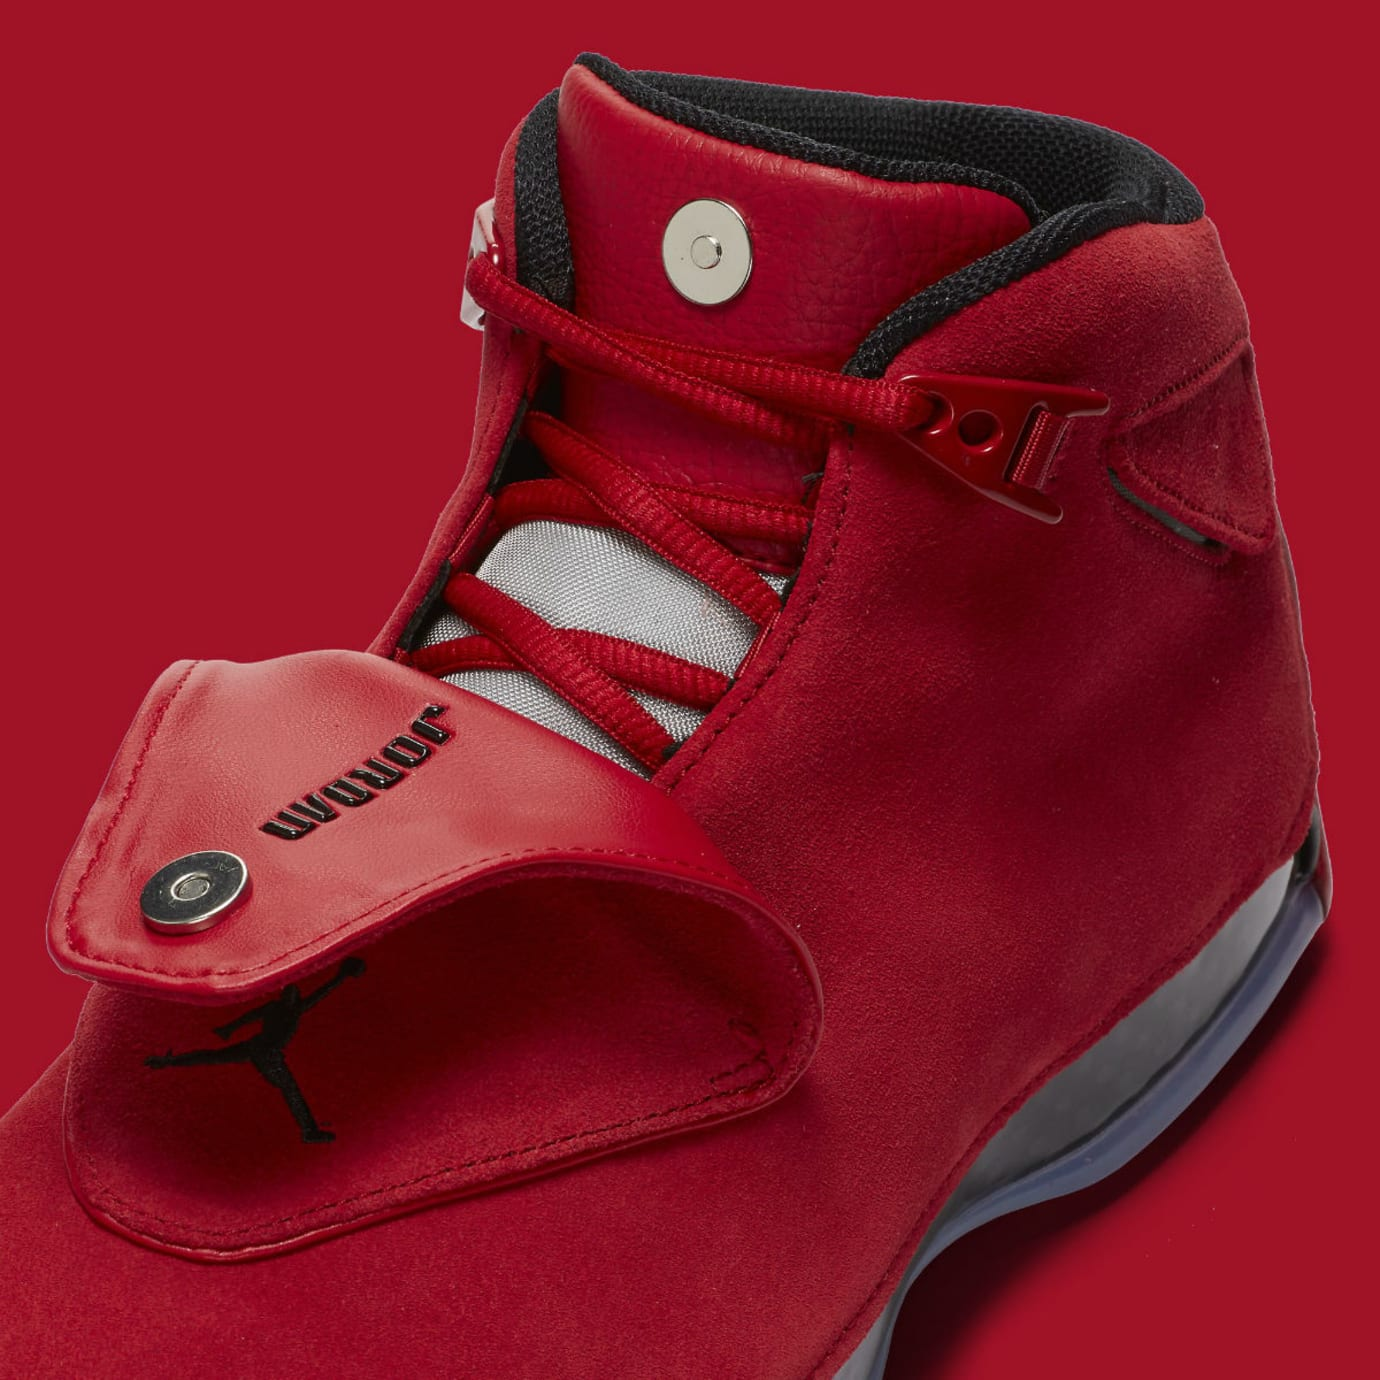 buy online f9f23 93bce Air Jordan 18 XVIII Toro Gym Red Release Date AA2494-601 Shroud